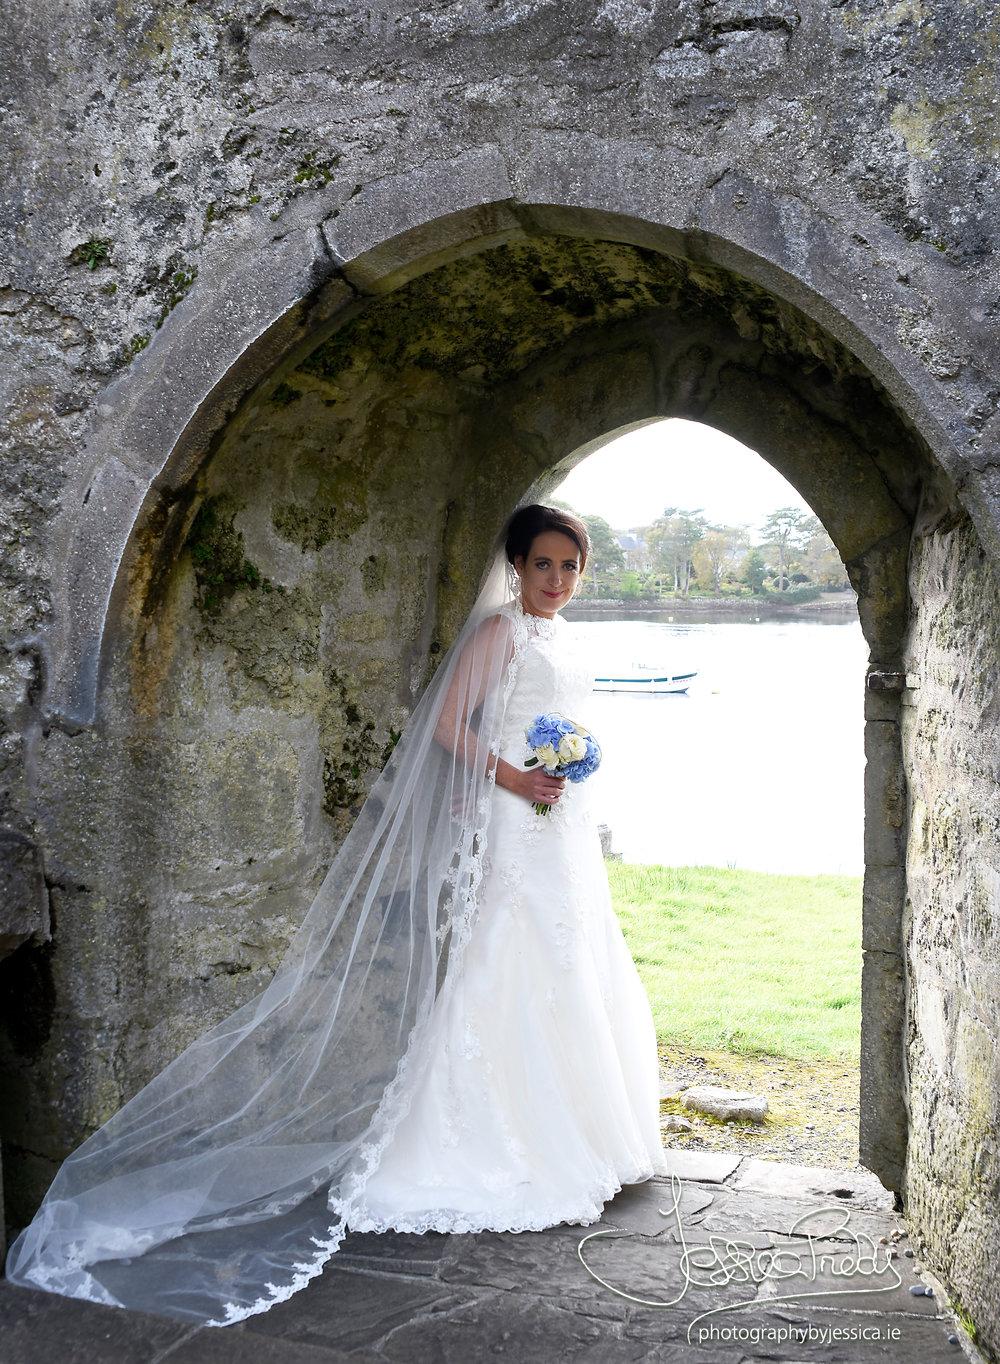 A Bride in her Wedding Dress